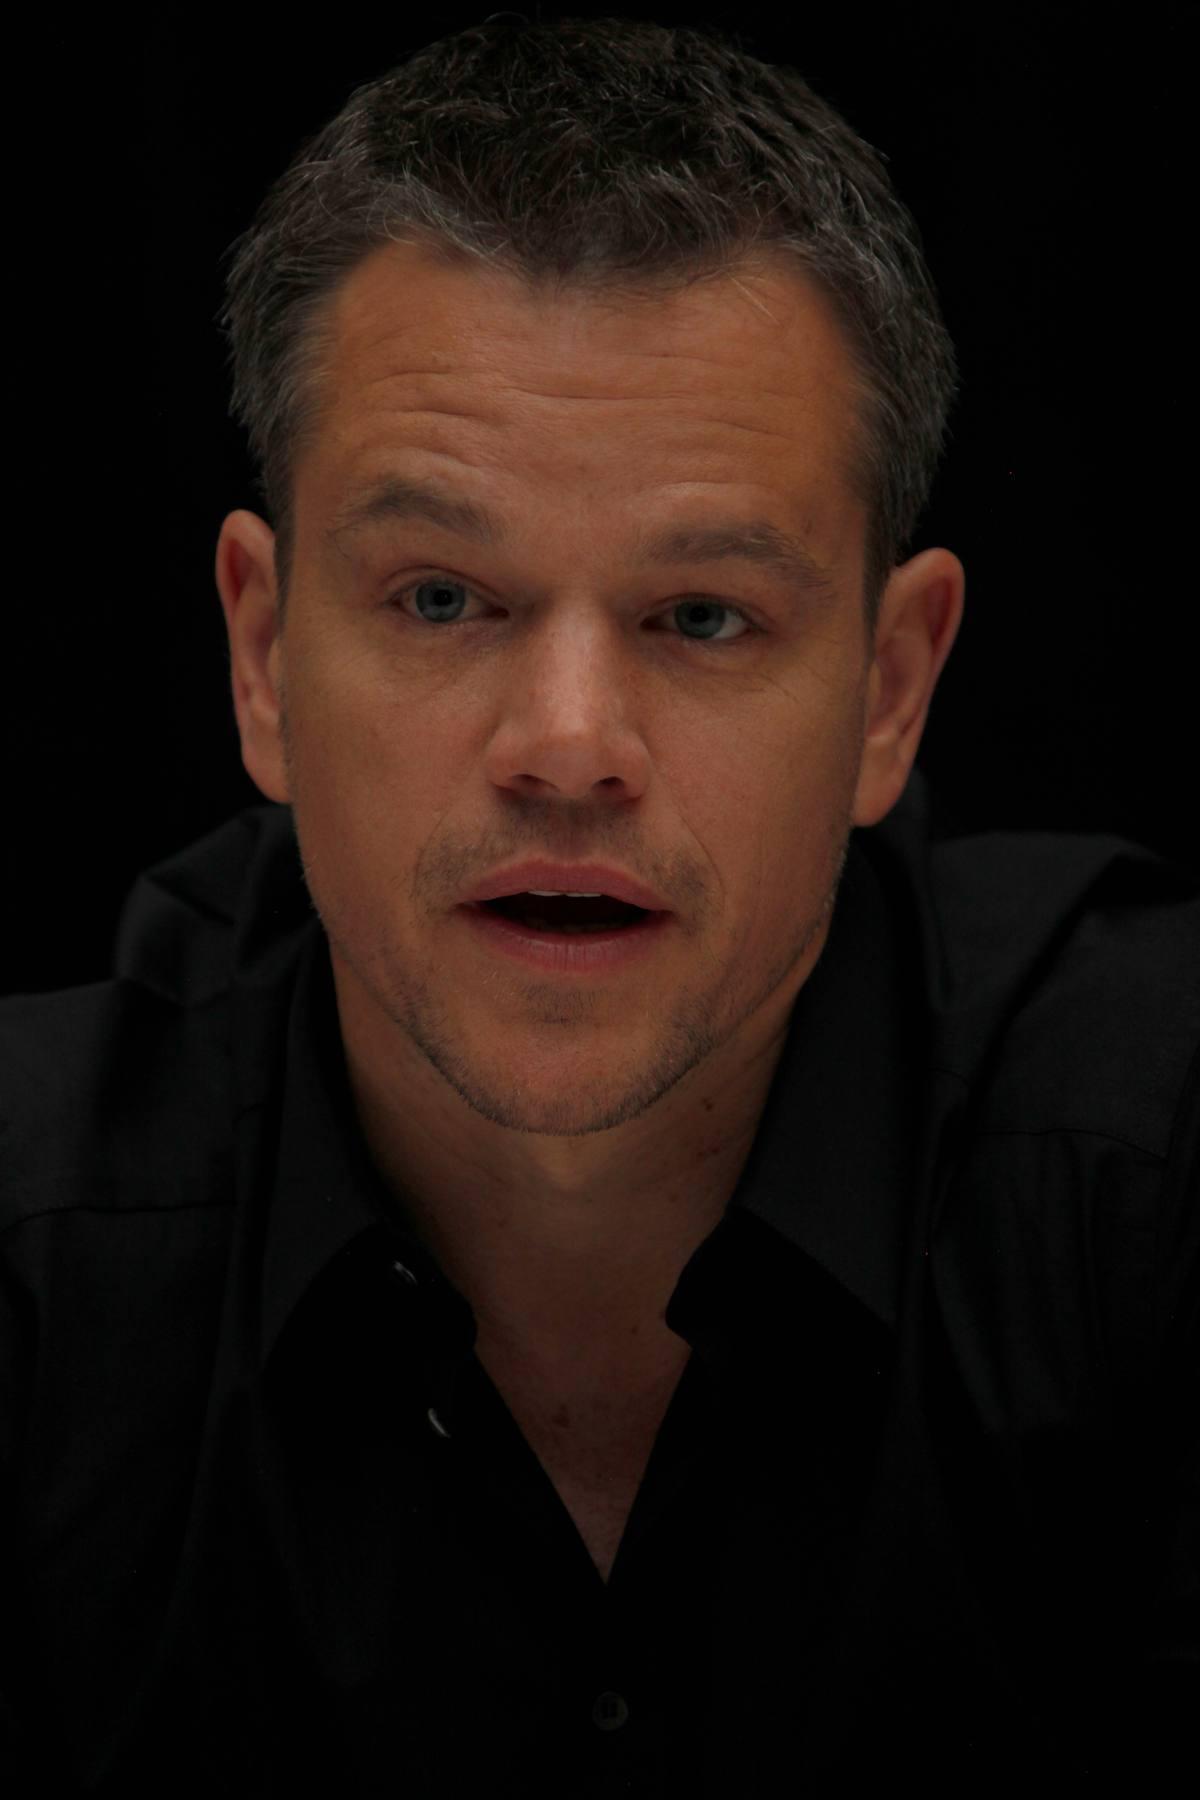 Matt Damone Martian Photocall-2